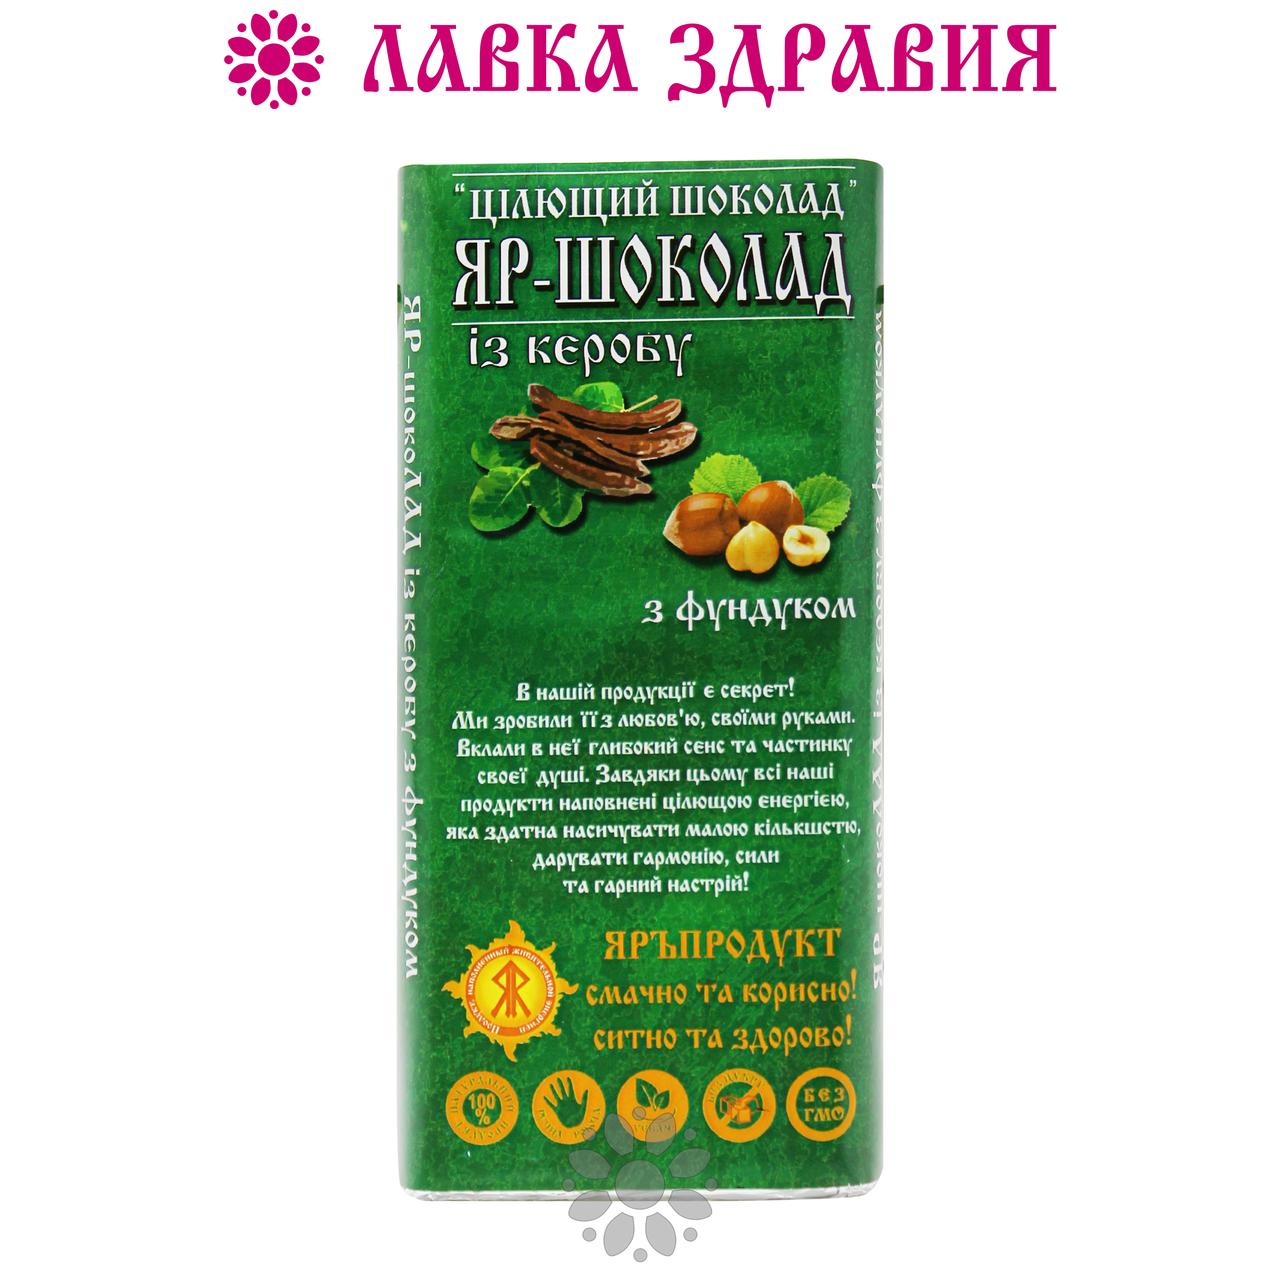 Яръ-шоколад с кэробом и фундуком, 100 г